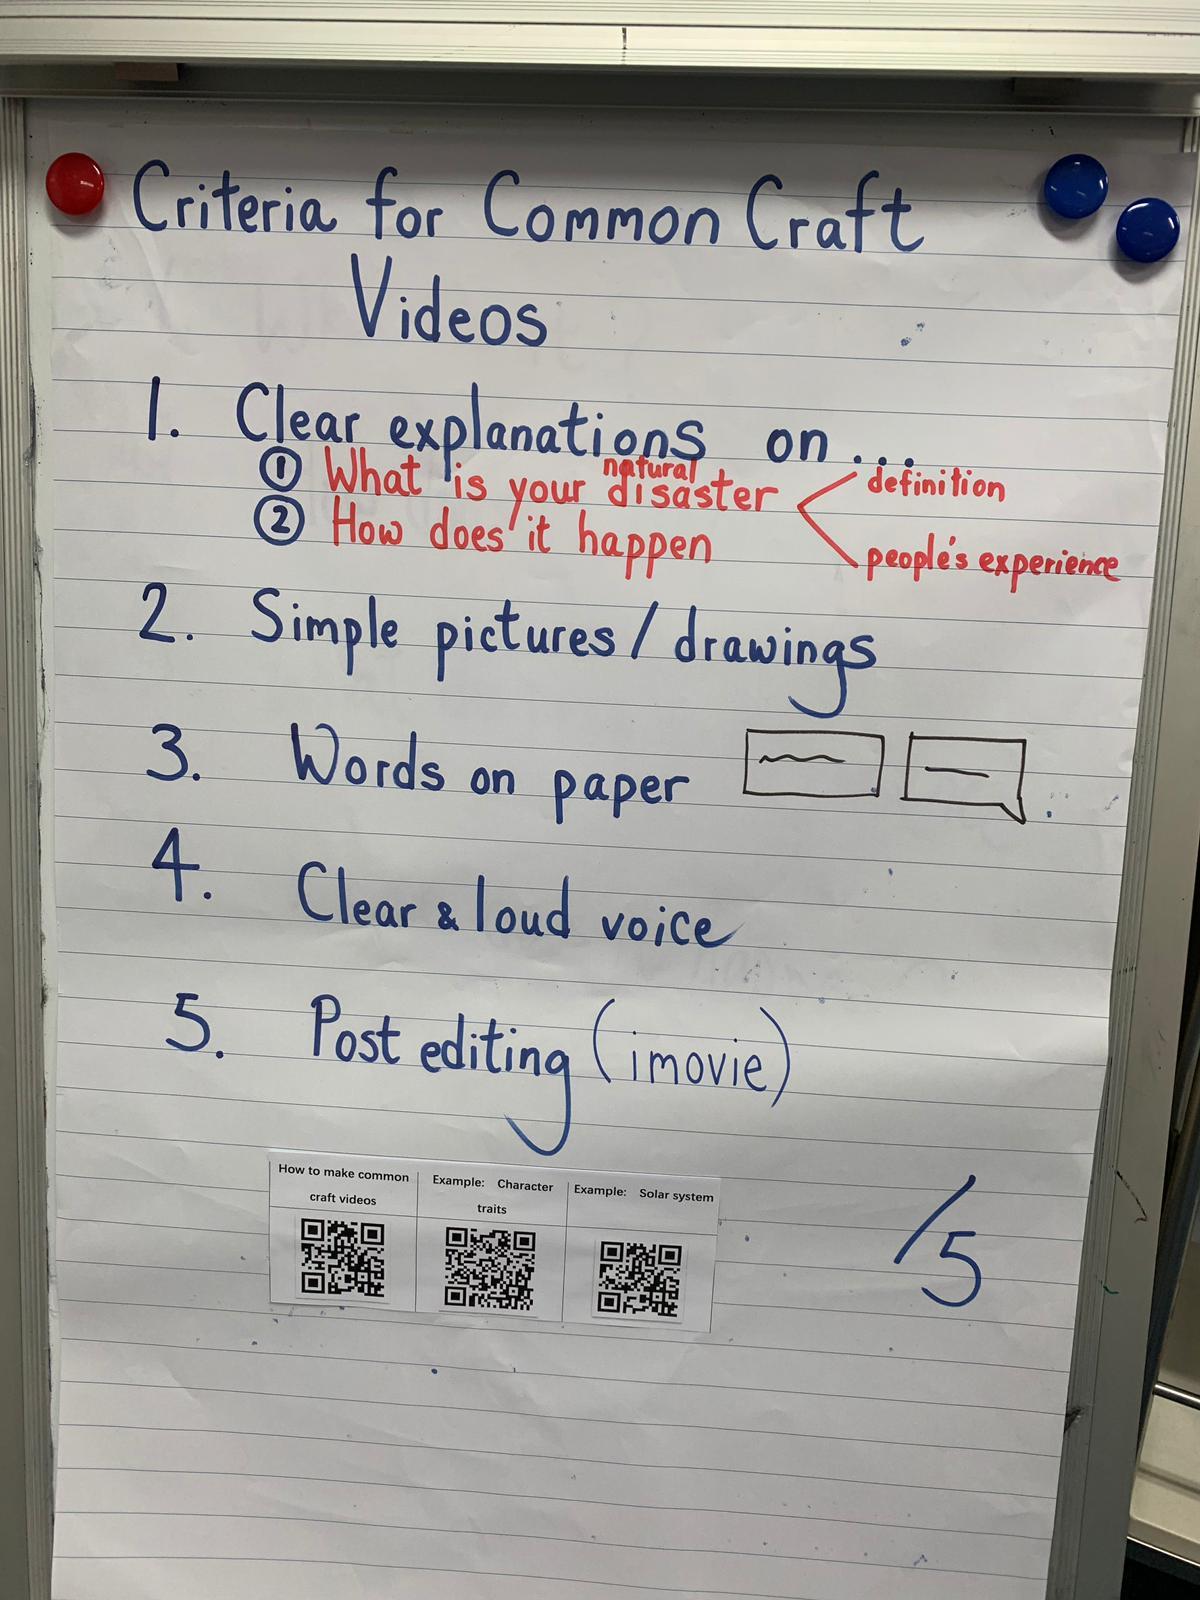 Criteria for Common Craft Videos